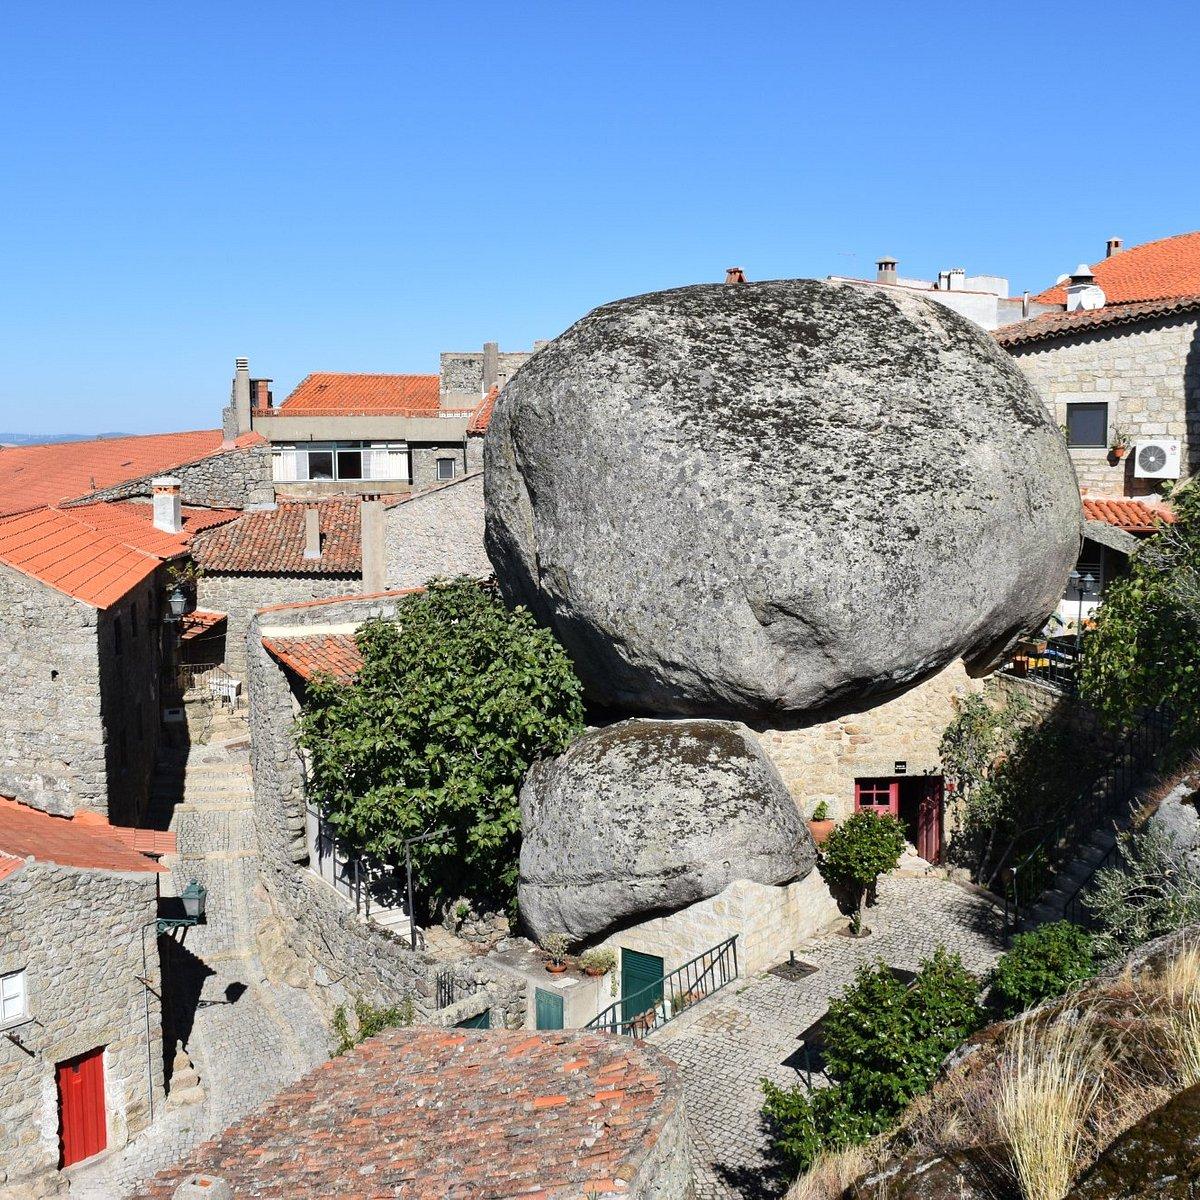 pt-central - 巨石の村モンサントを散策しフンダンへ - 旅ログヨーロッパ, 旅ログポルトガル, ポルトガル街歩き, ポルトガル宿